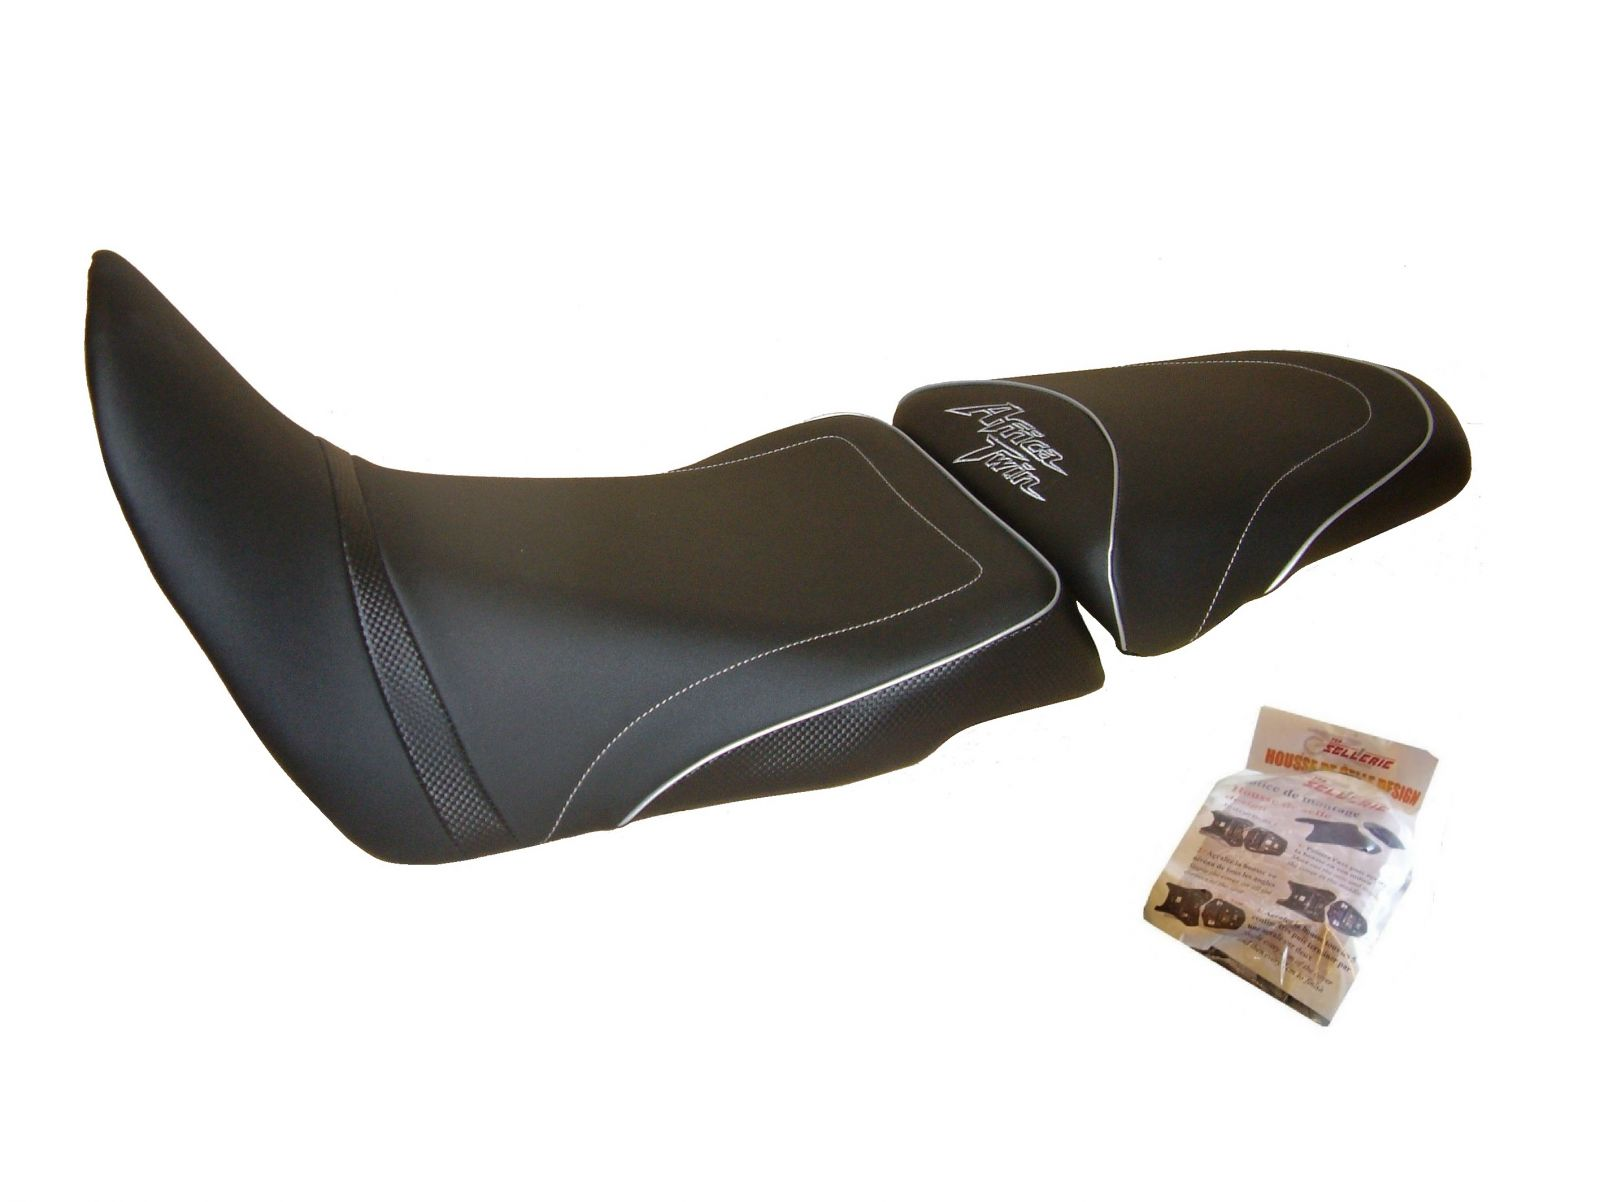 housse de selle design hsd4246 honda africa twin crf 1000 l 2016 tarifs pour france. Black Bedroom Furniture Sets. Home Design Ideas